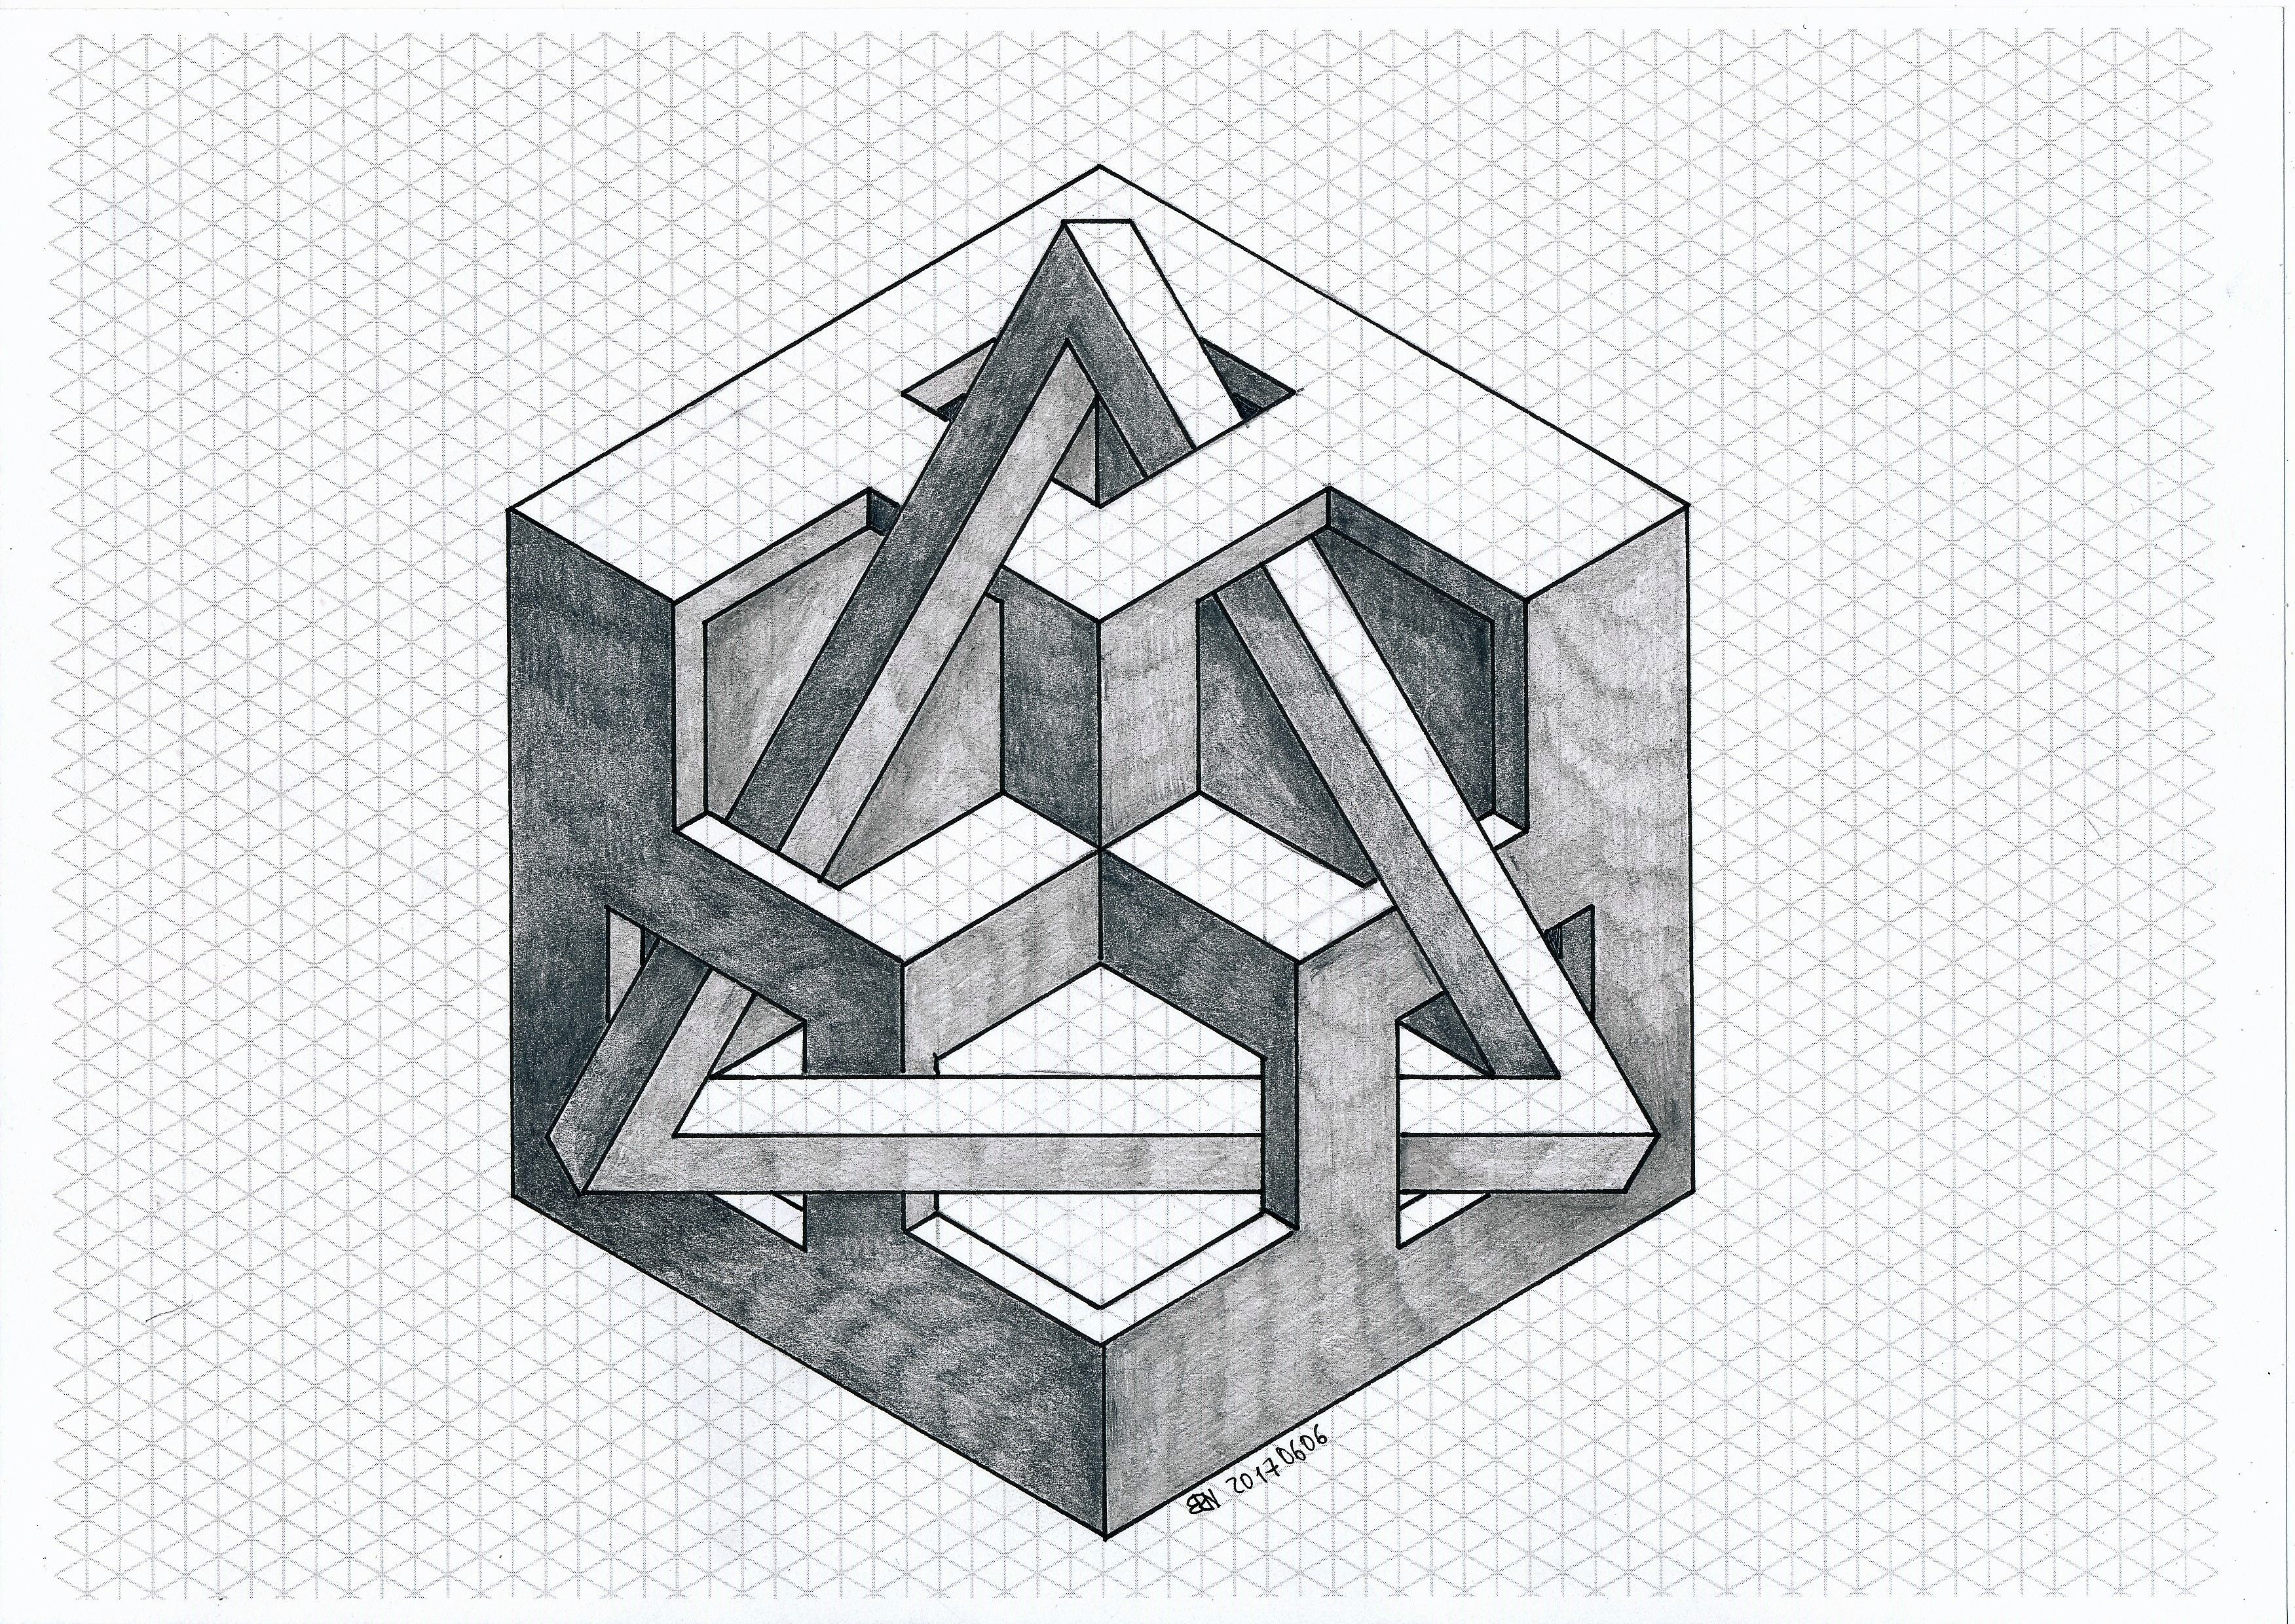 #impossible #isometric #geometry #symmetry #hexagon #